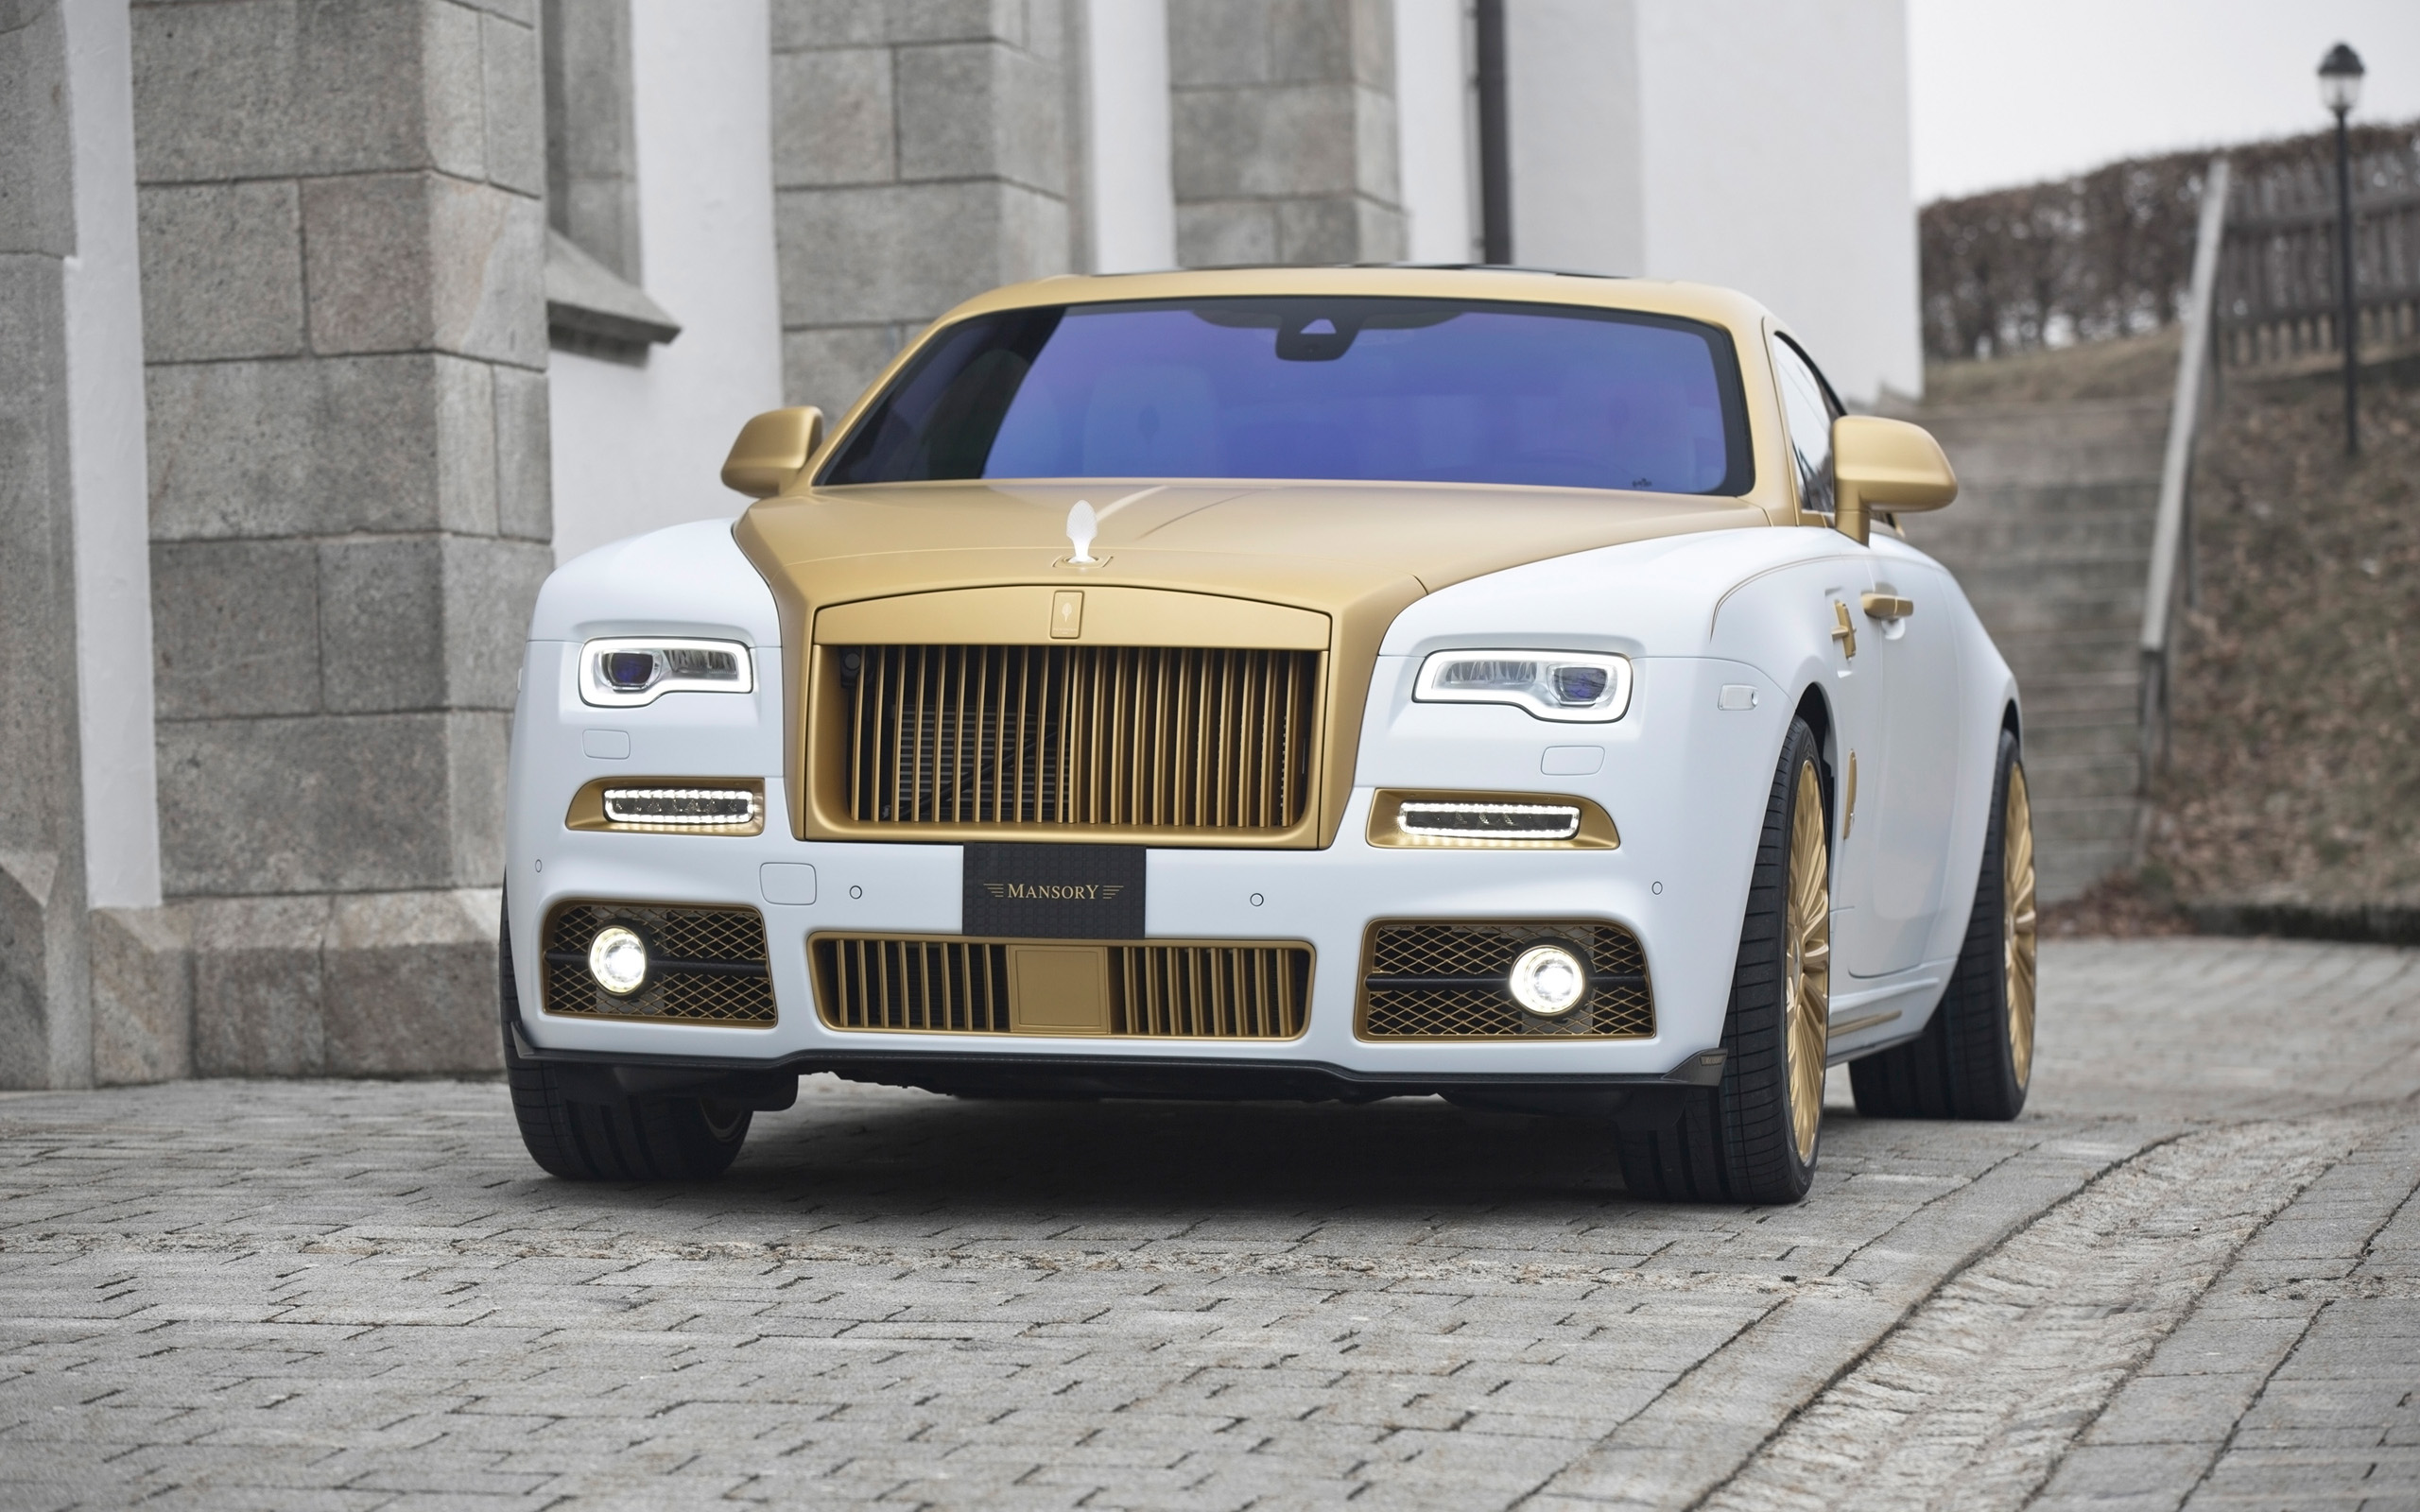 4k Wallpaper Of Rolls Royce 3054442 Hd Wallpaper Backgrounds Download